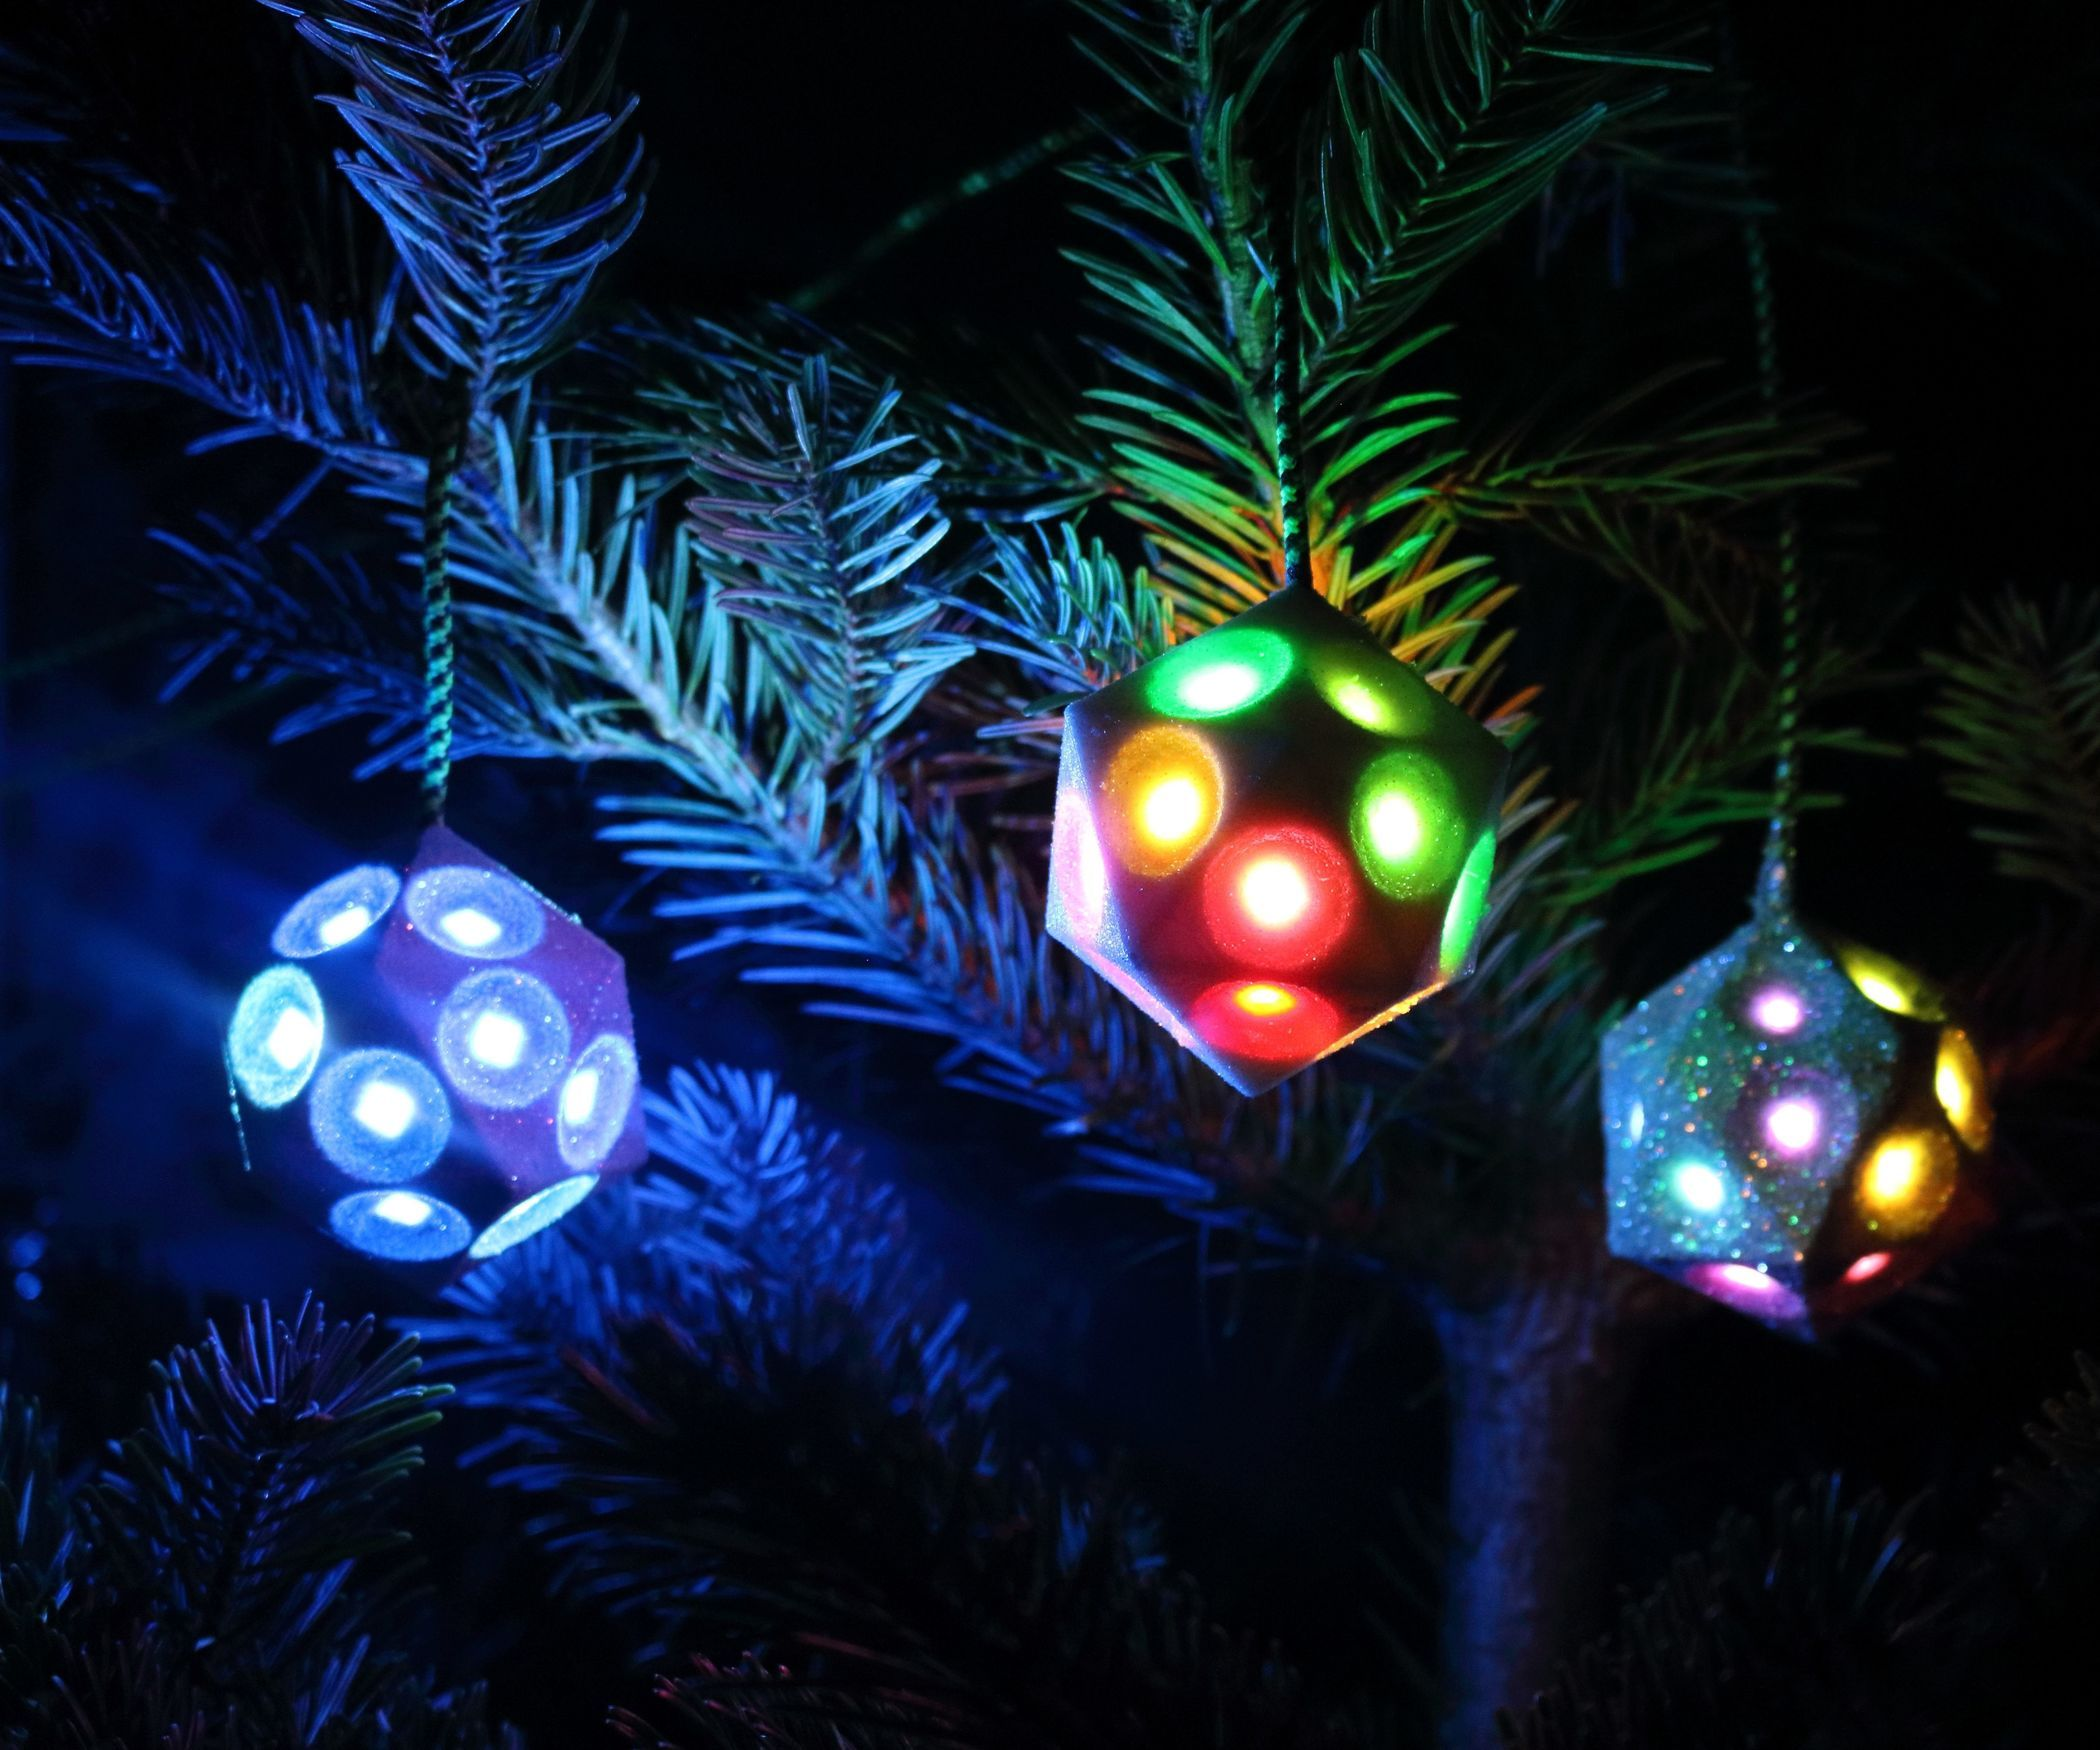 Illuminated Christmas Tree Ornament Wifi Controlled Christmas Tree Ornaments Christmas Ornaments To Make Christmas Ornaments